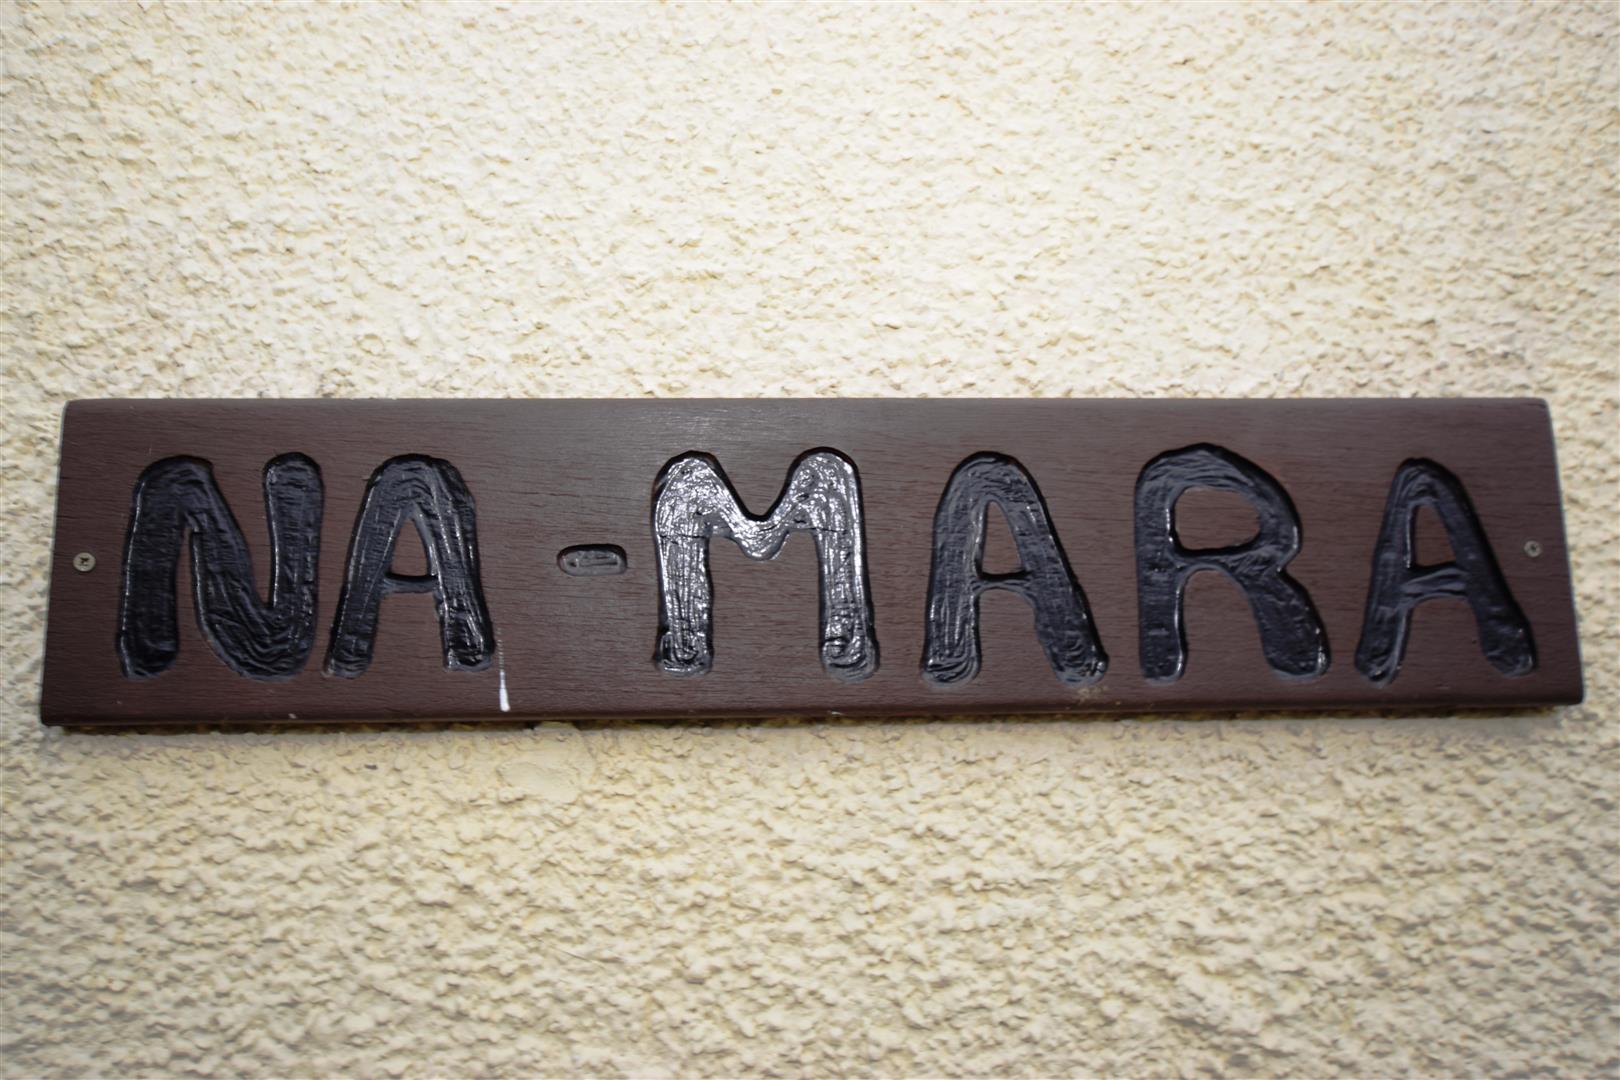 Na-Mara, 46, Castlelaw Crescent, Abernethy, Perthshire, PH2 9LP, UK